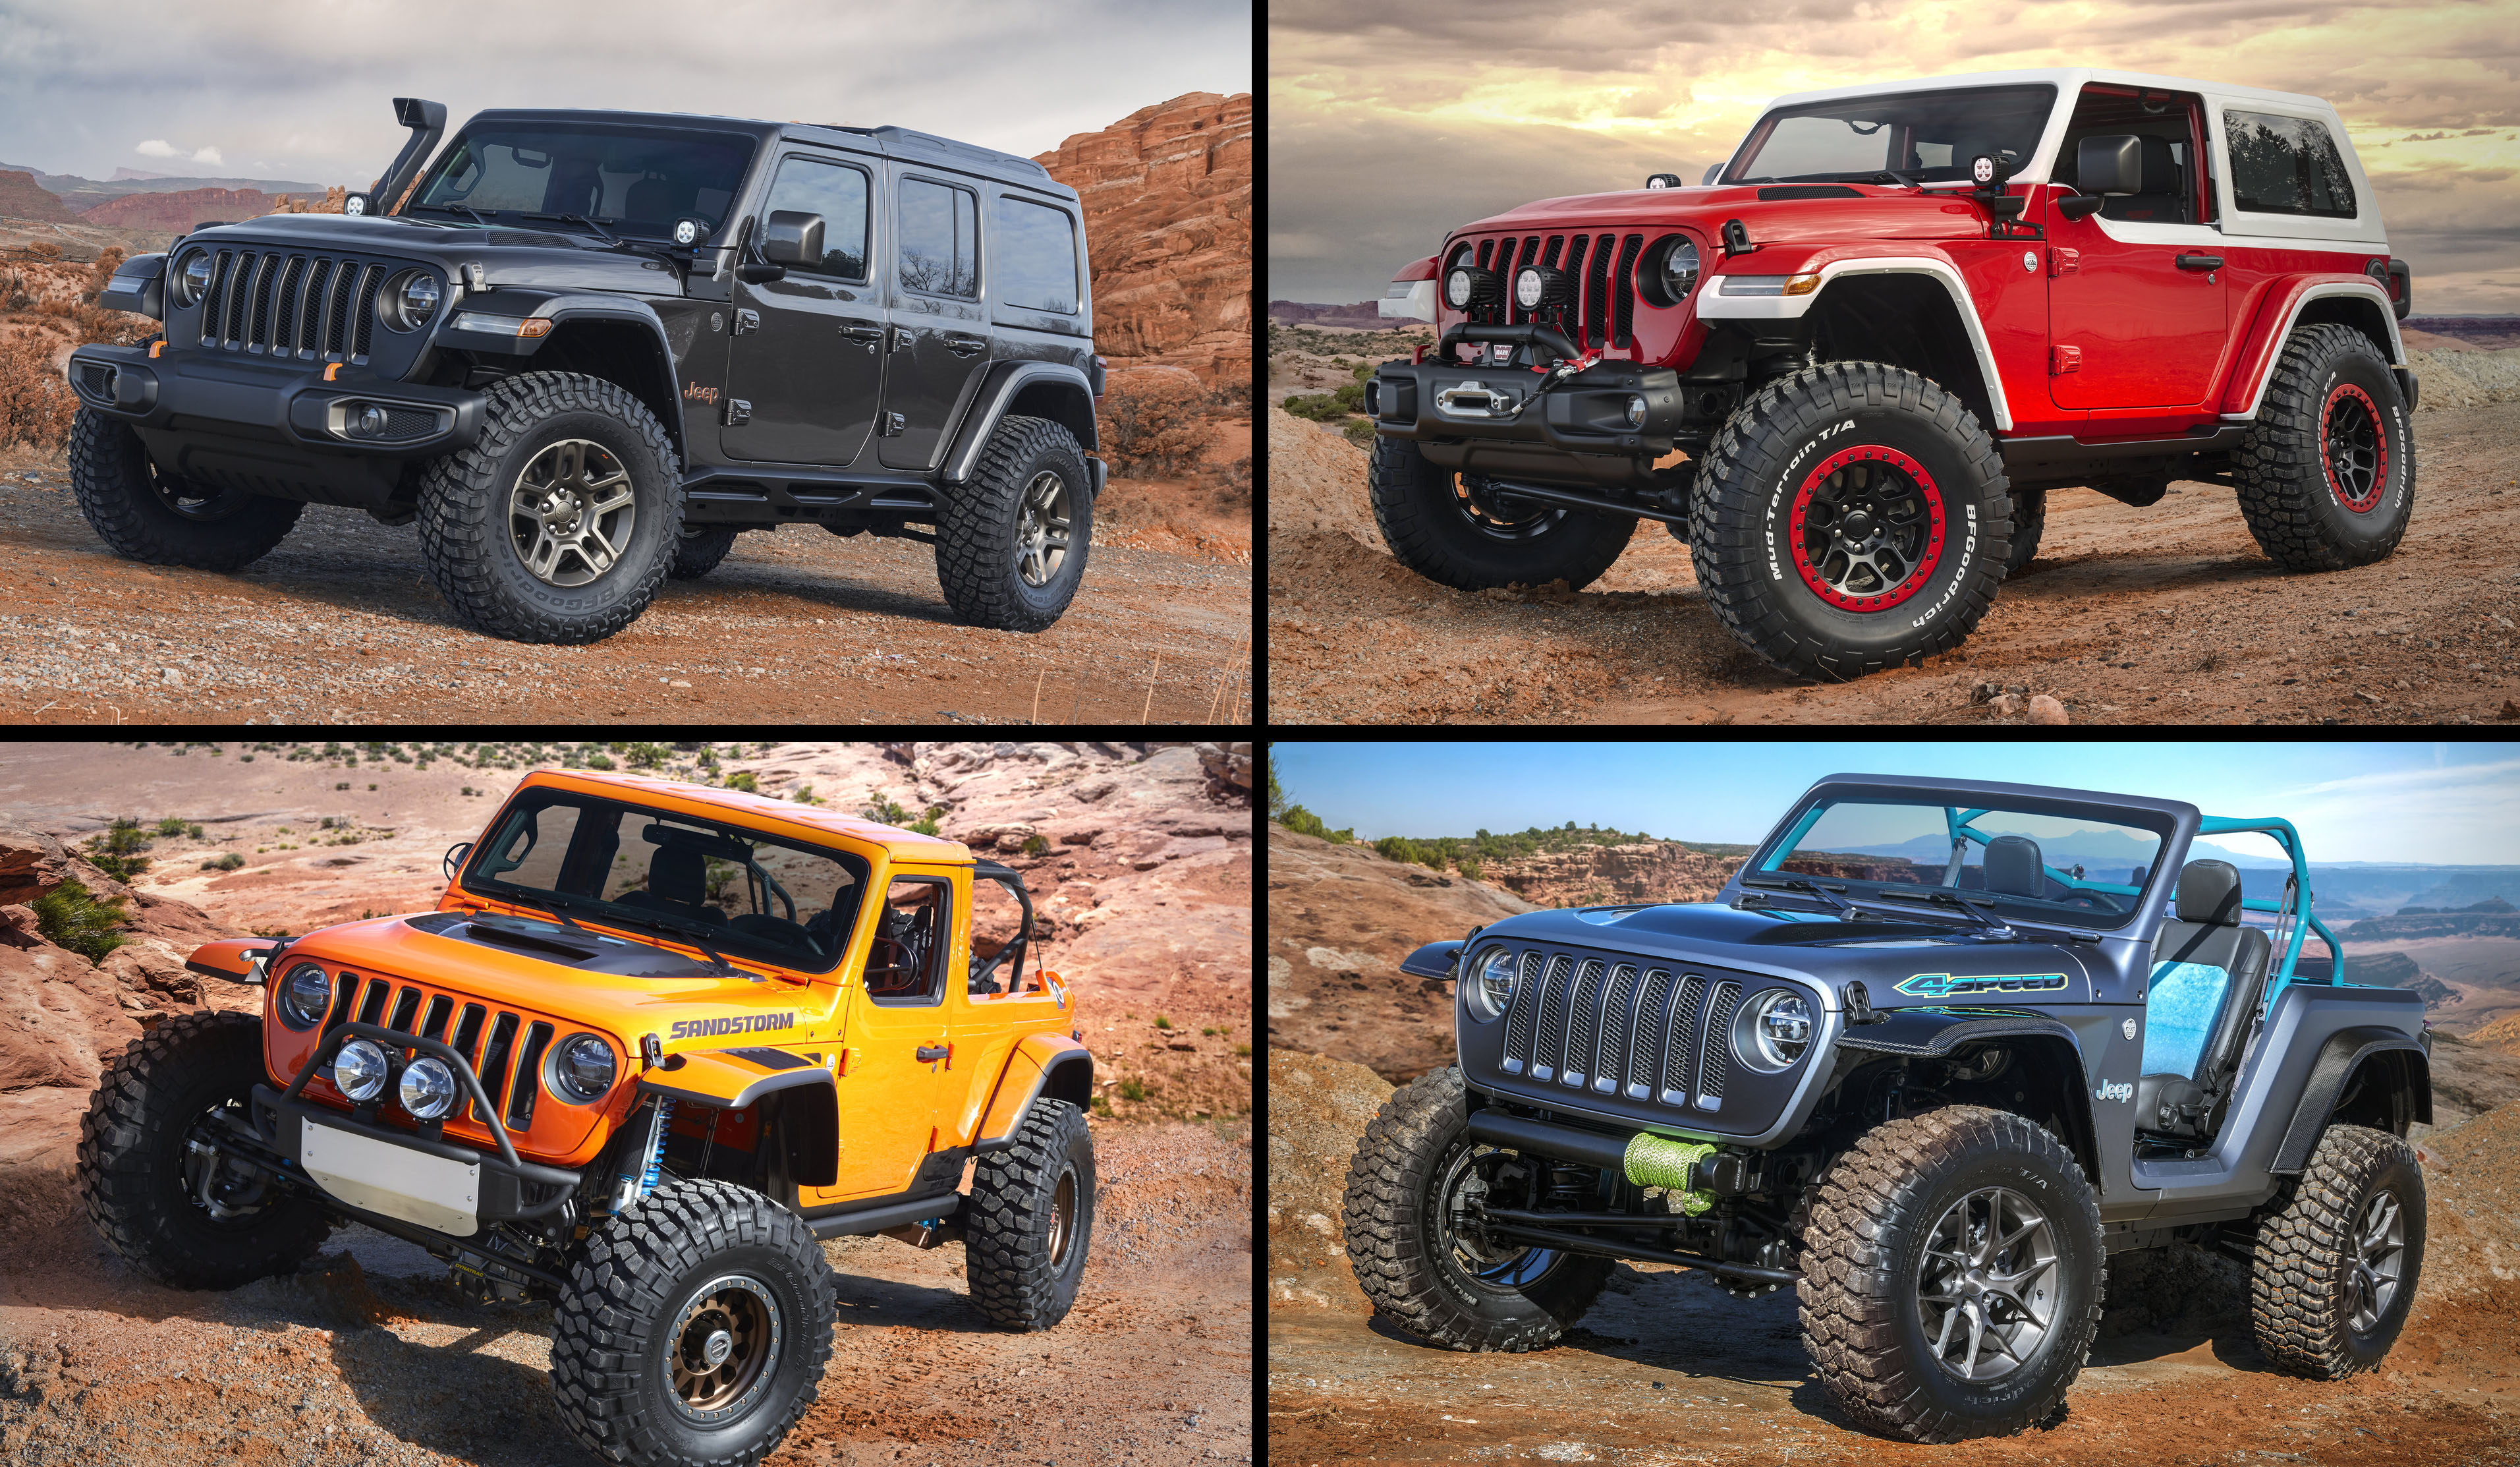 Wrangler Based 2018 Jeep Easter Safari Concepts Revealed 4sd Sandstorm Nacho Jeepster J Wagon Jl Forums New